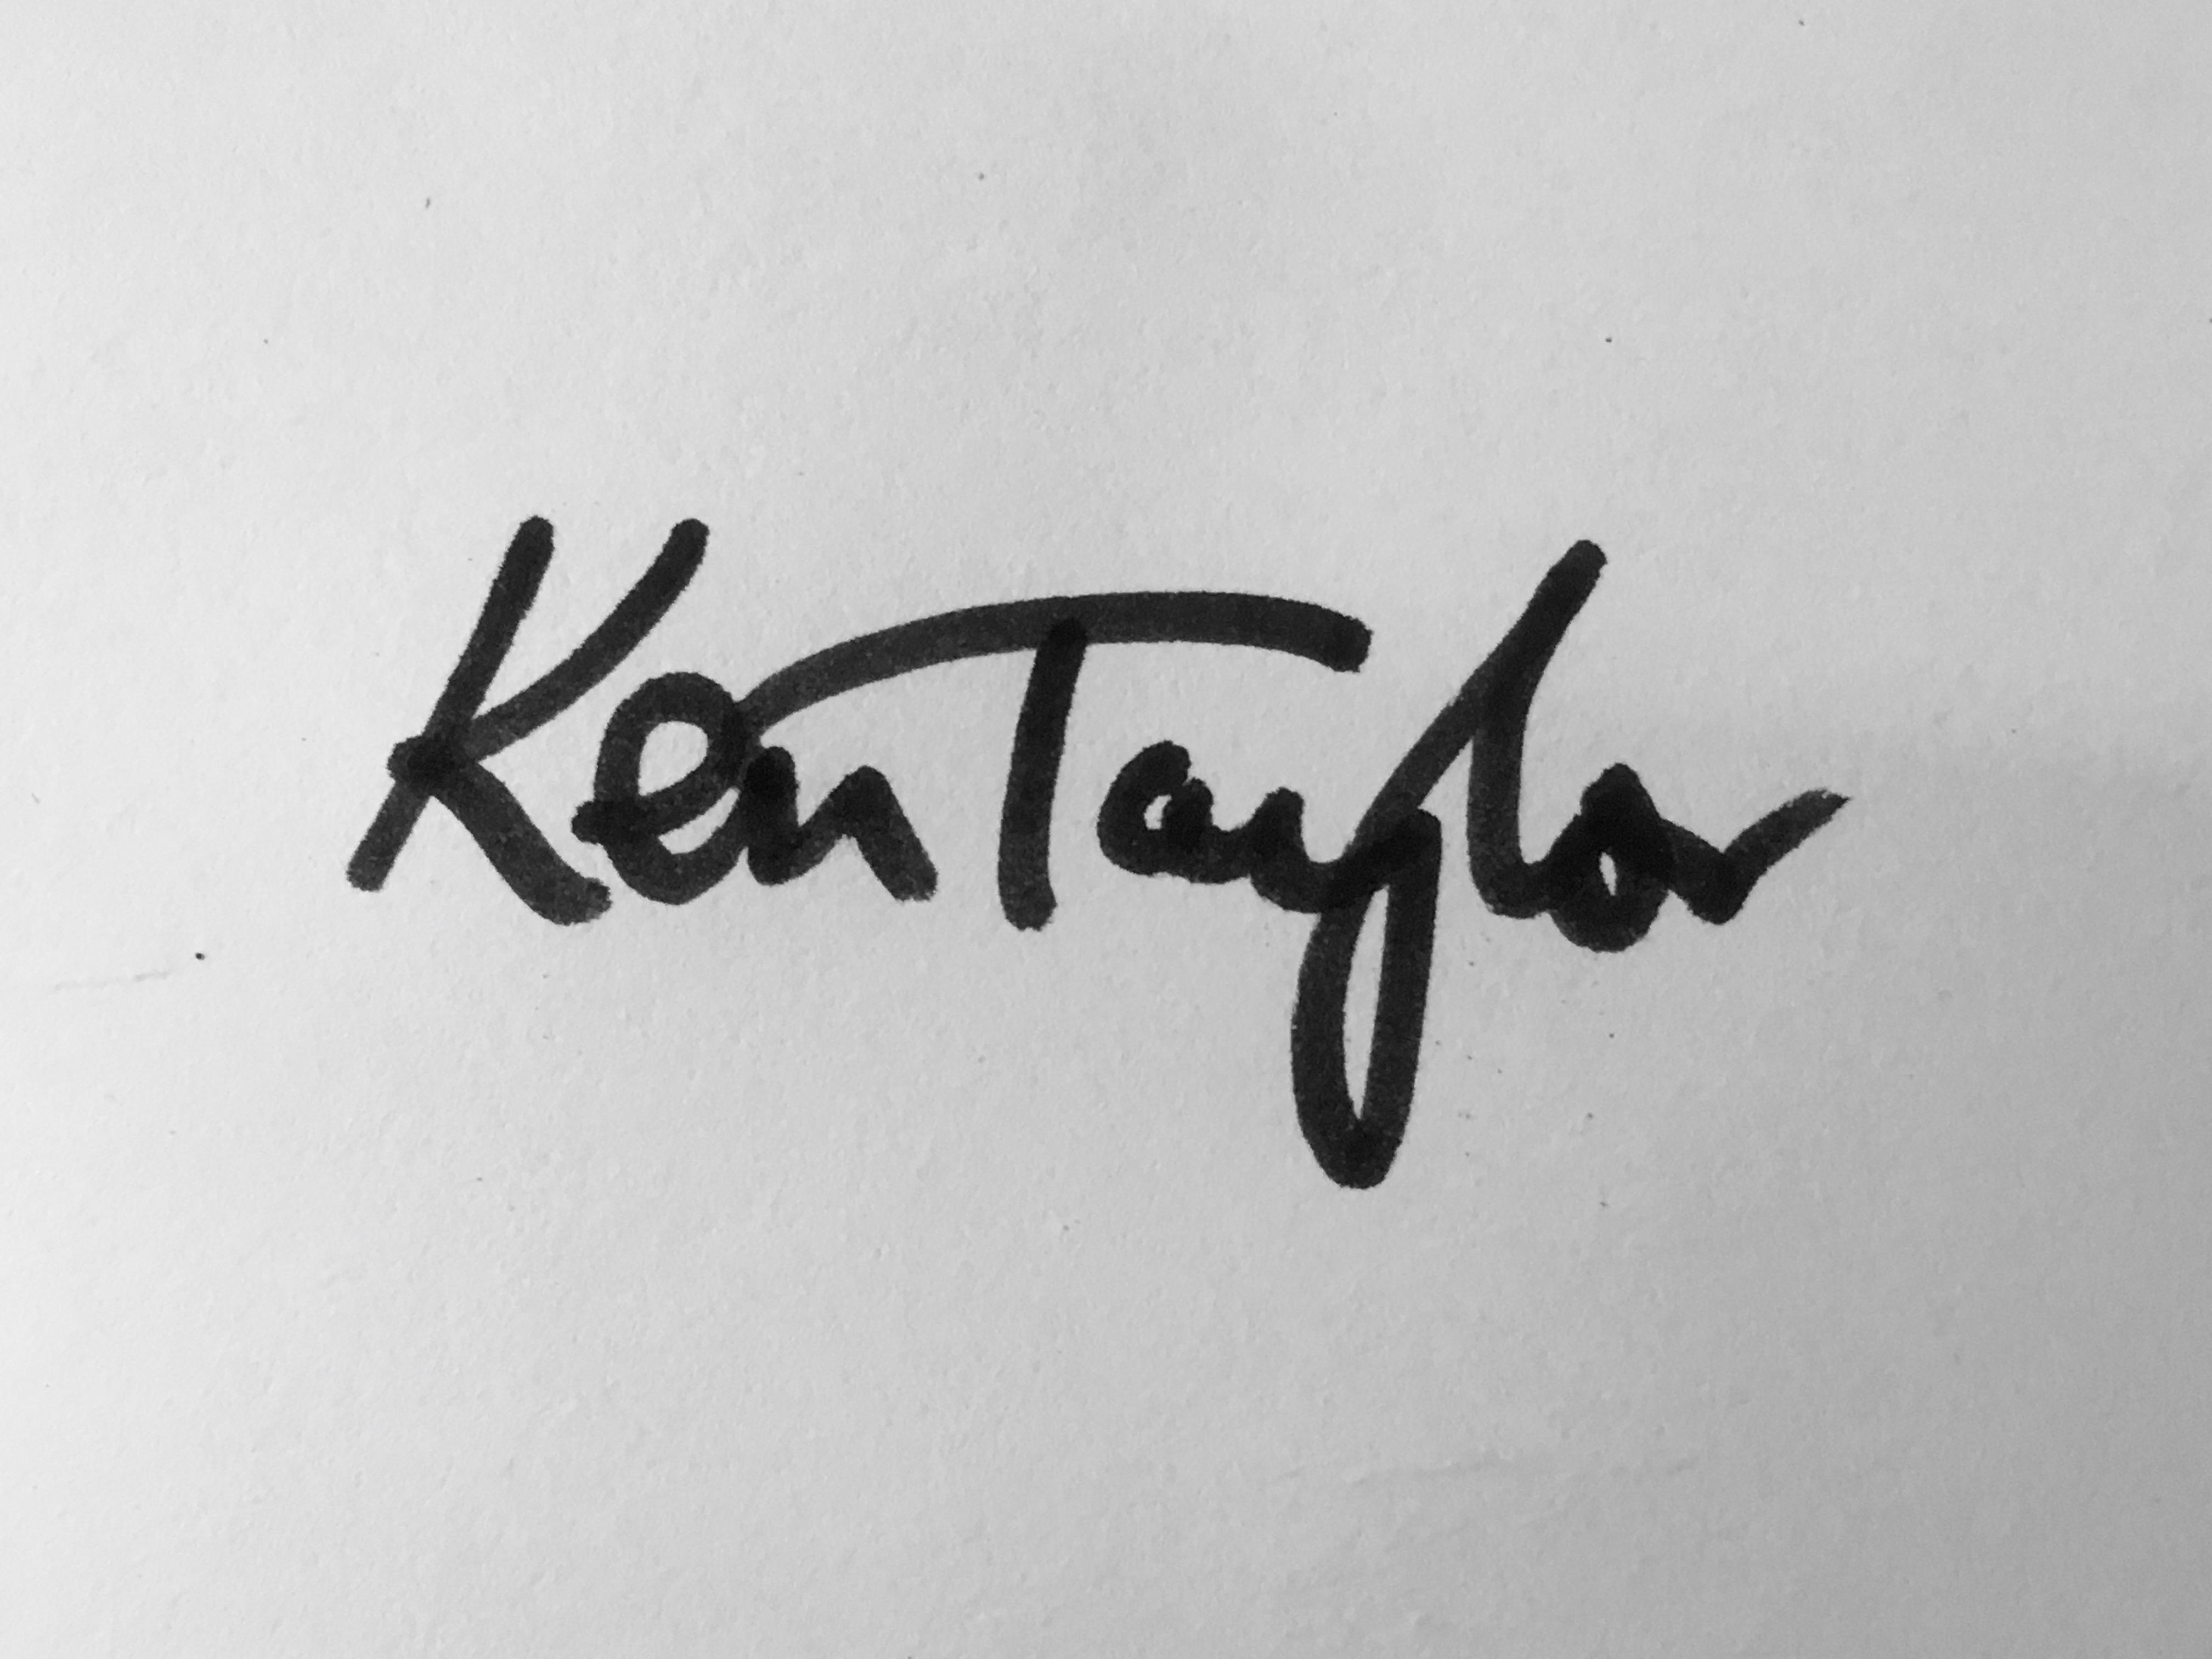 Ken Taylor Signature